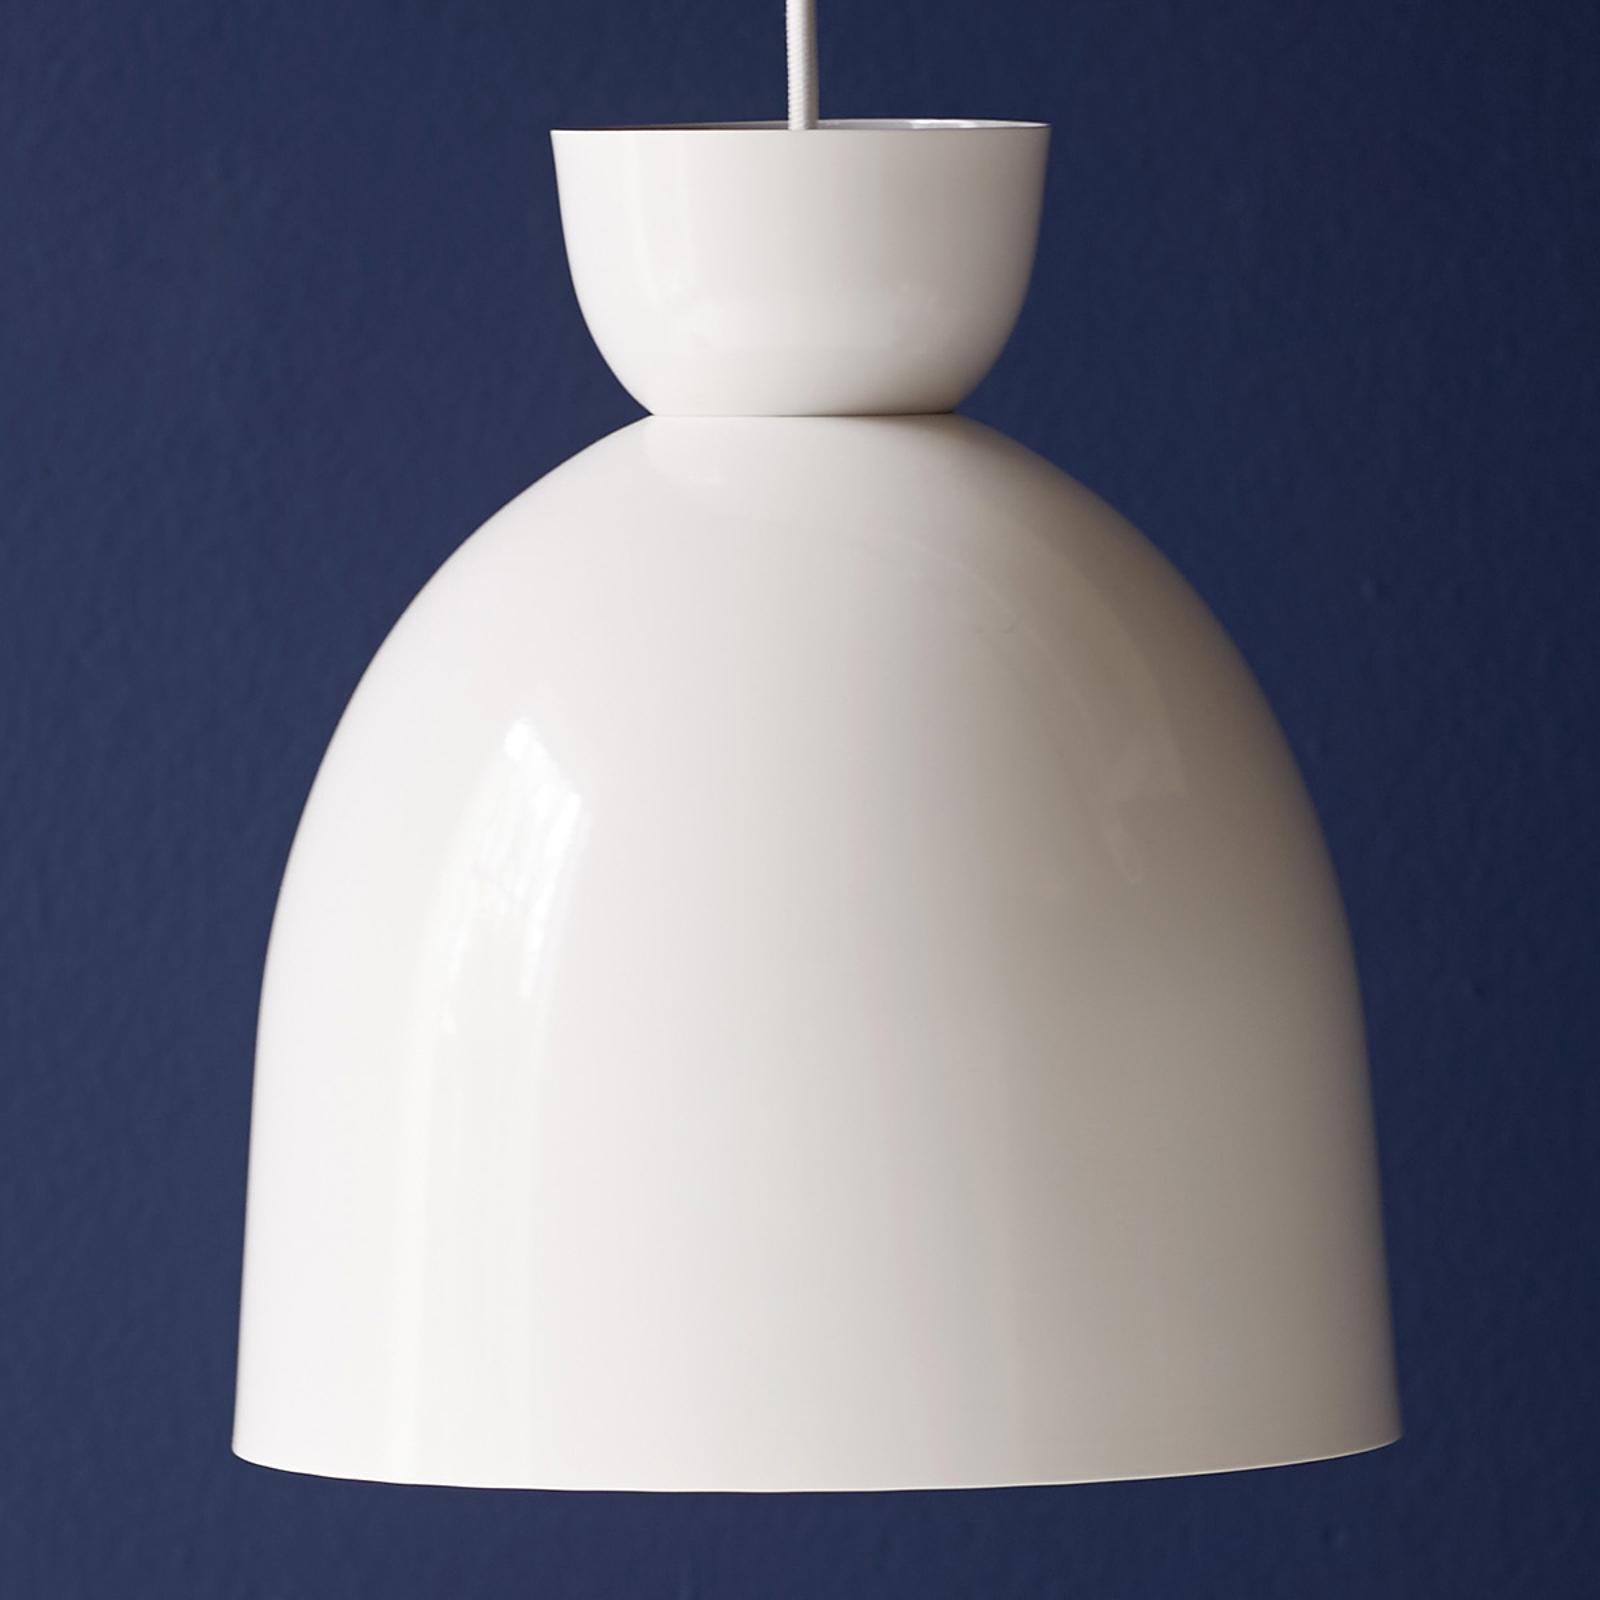 Circus - lampa wisząca Ø 27 cm biała